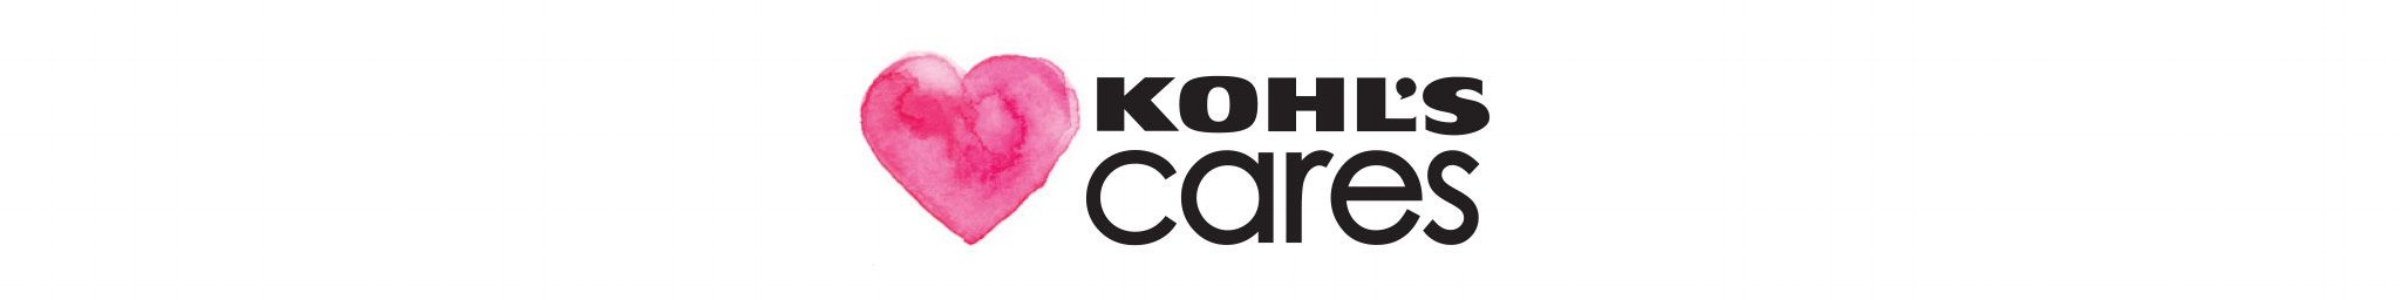 KohlsCares-040516-01-01.jpeg